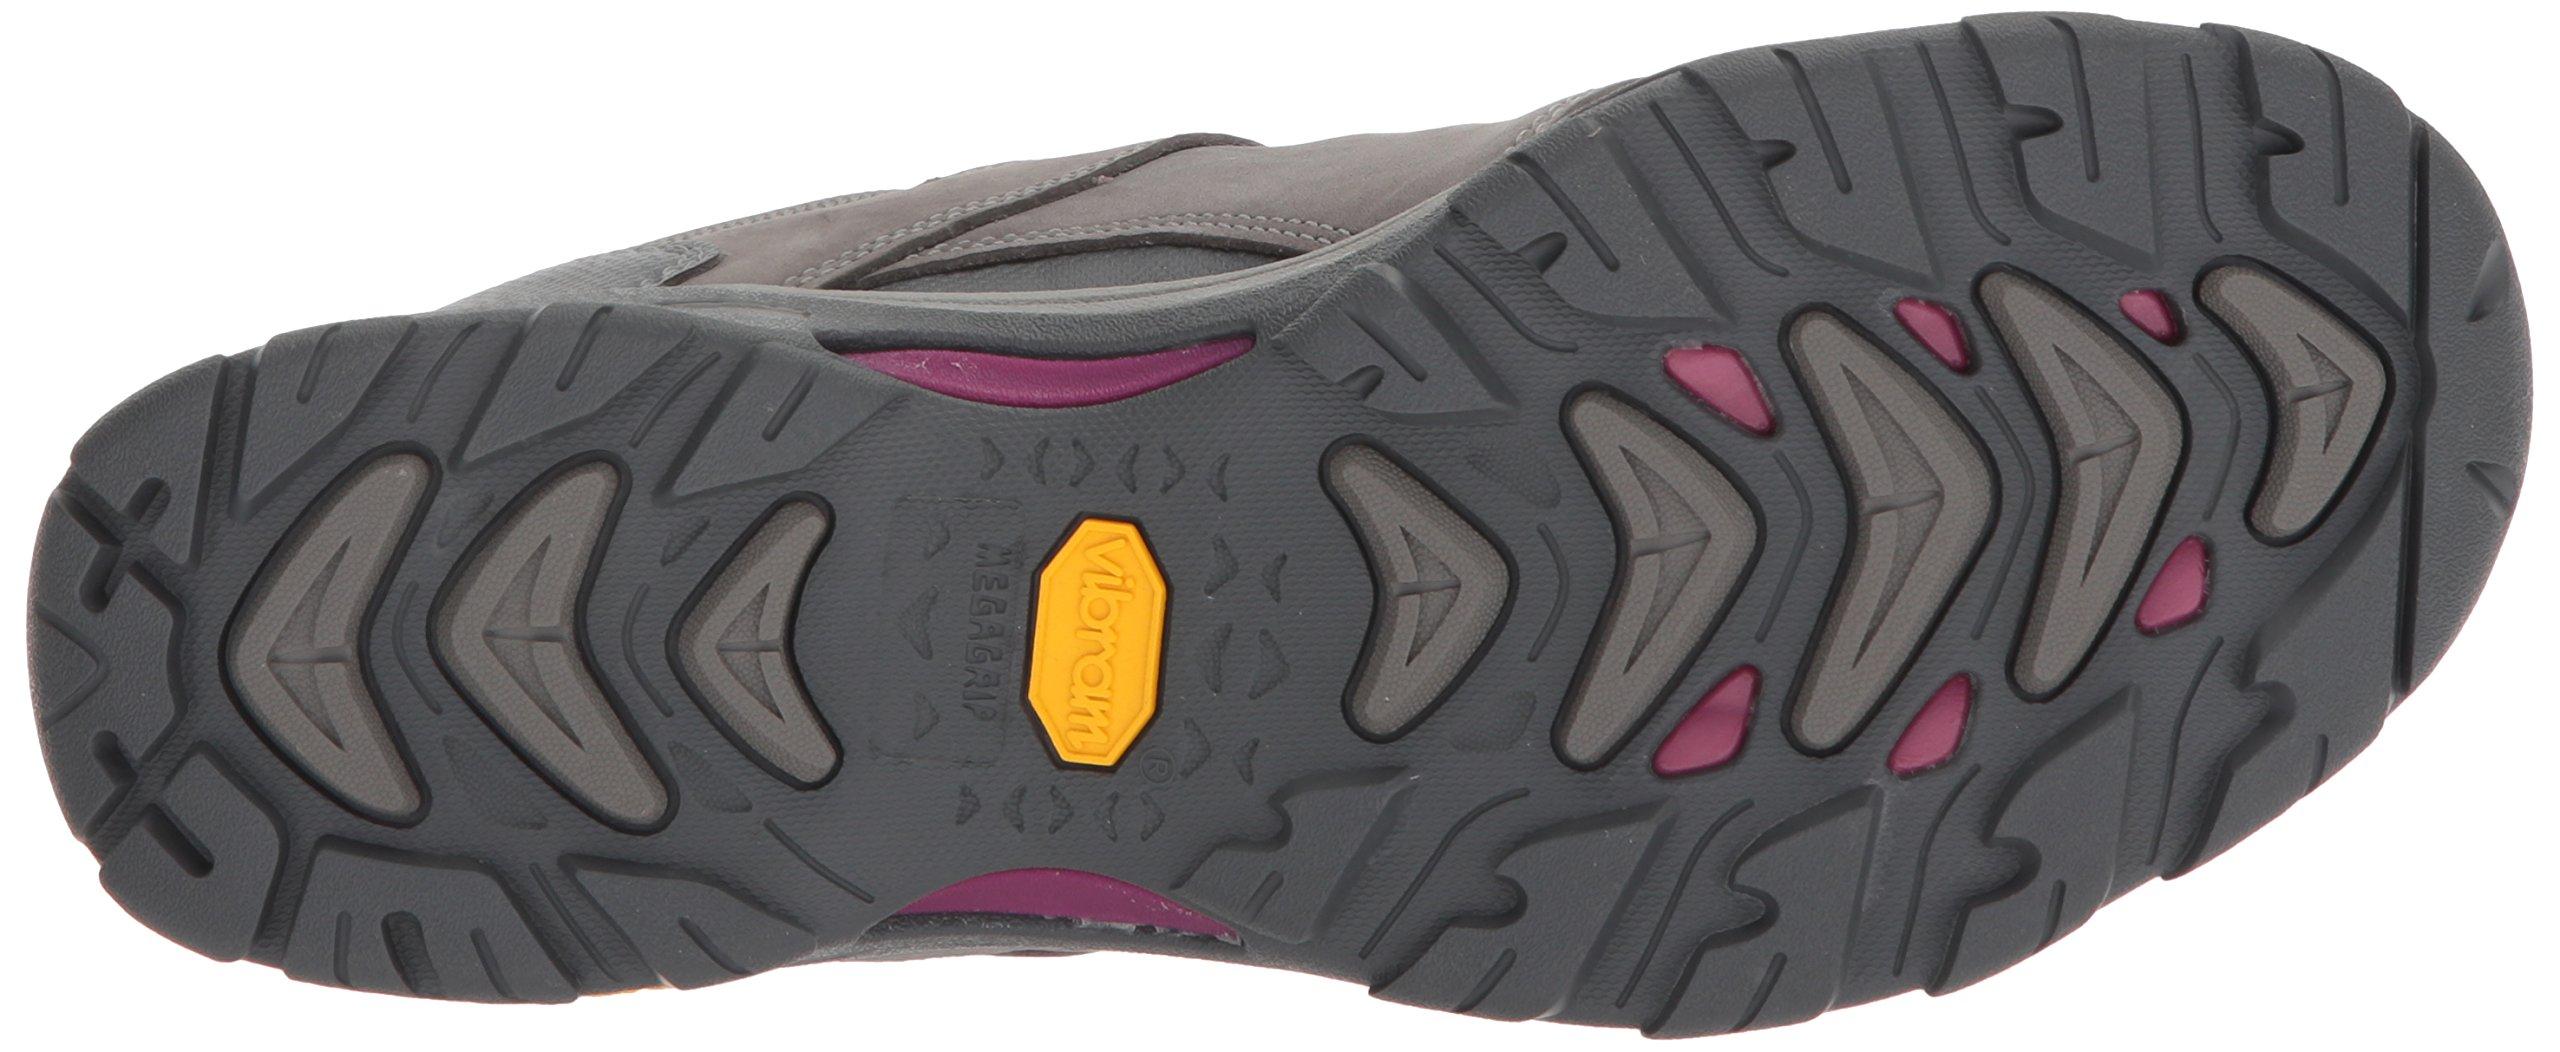 Ahnu Women's W Montara III Event Hiking Boot, Charcoal, 6 Medium US by Ahnu (Image #3)